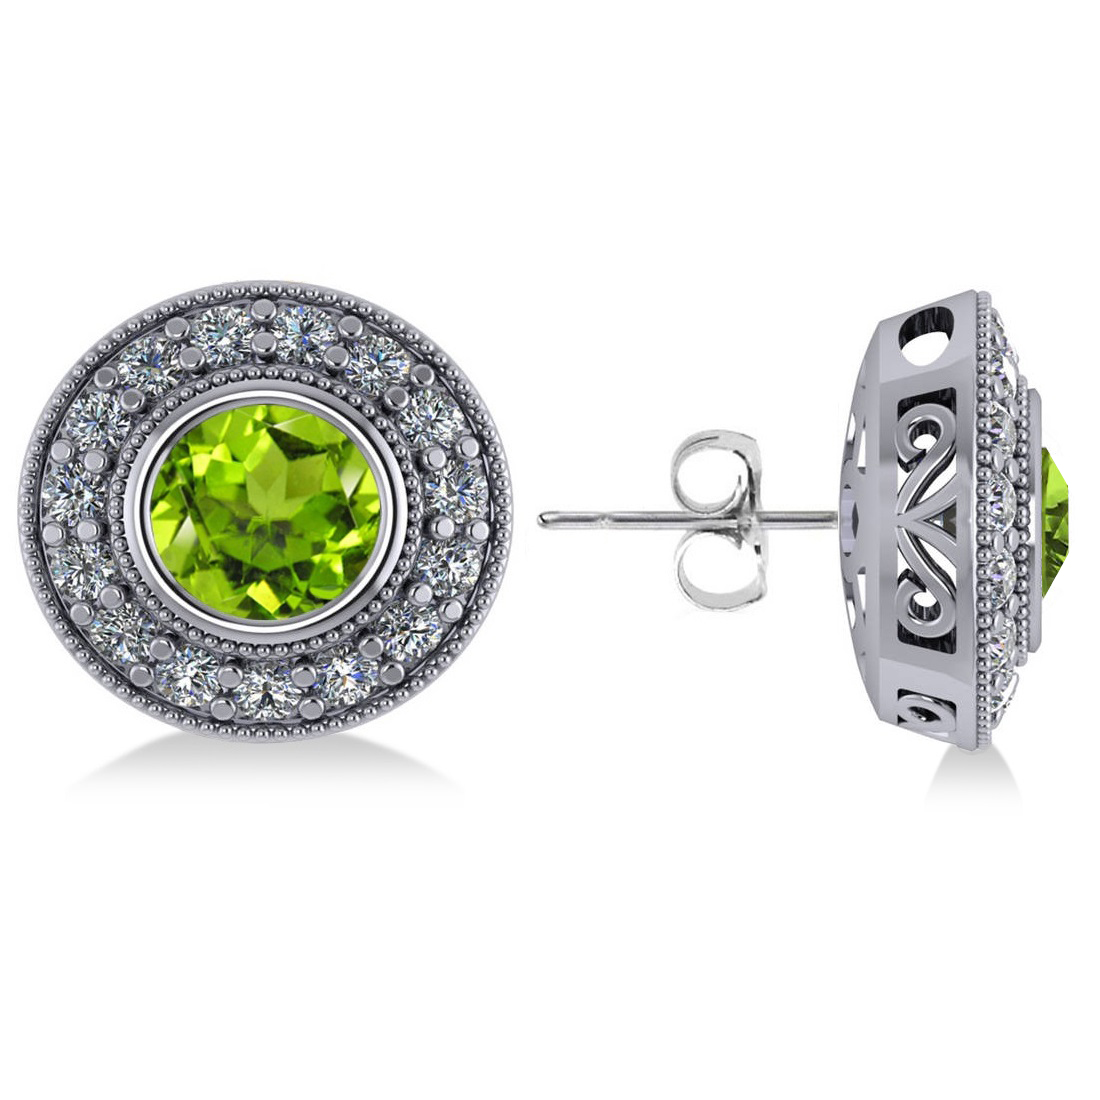 Peridot & Diamond Halo Round Earrings 14k White Gold (3.12ct)